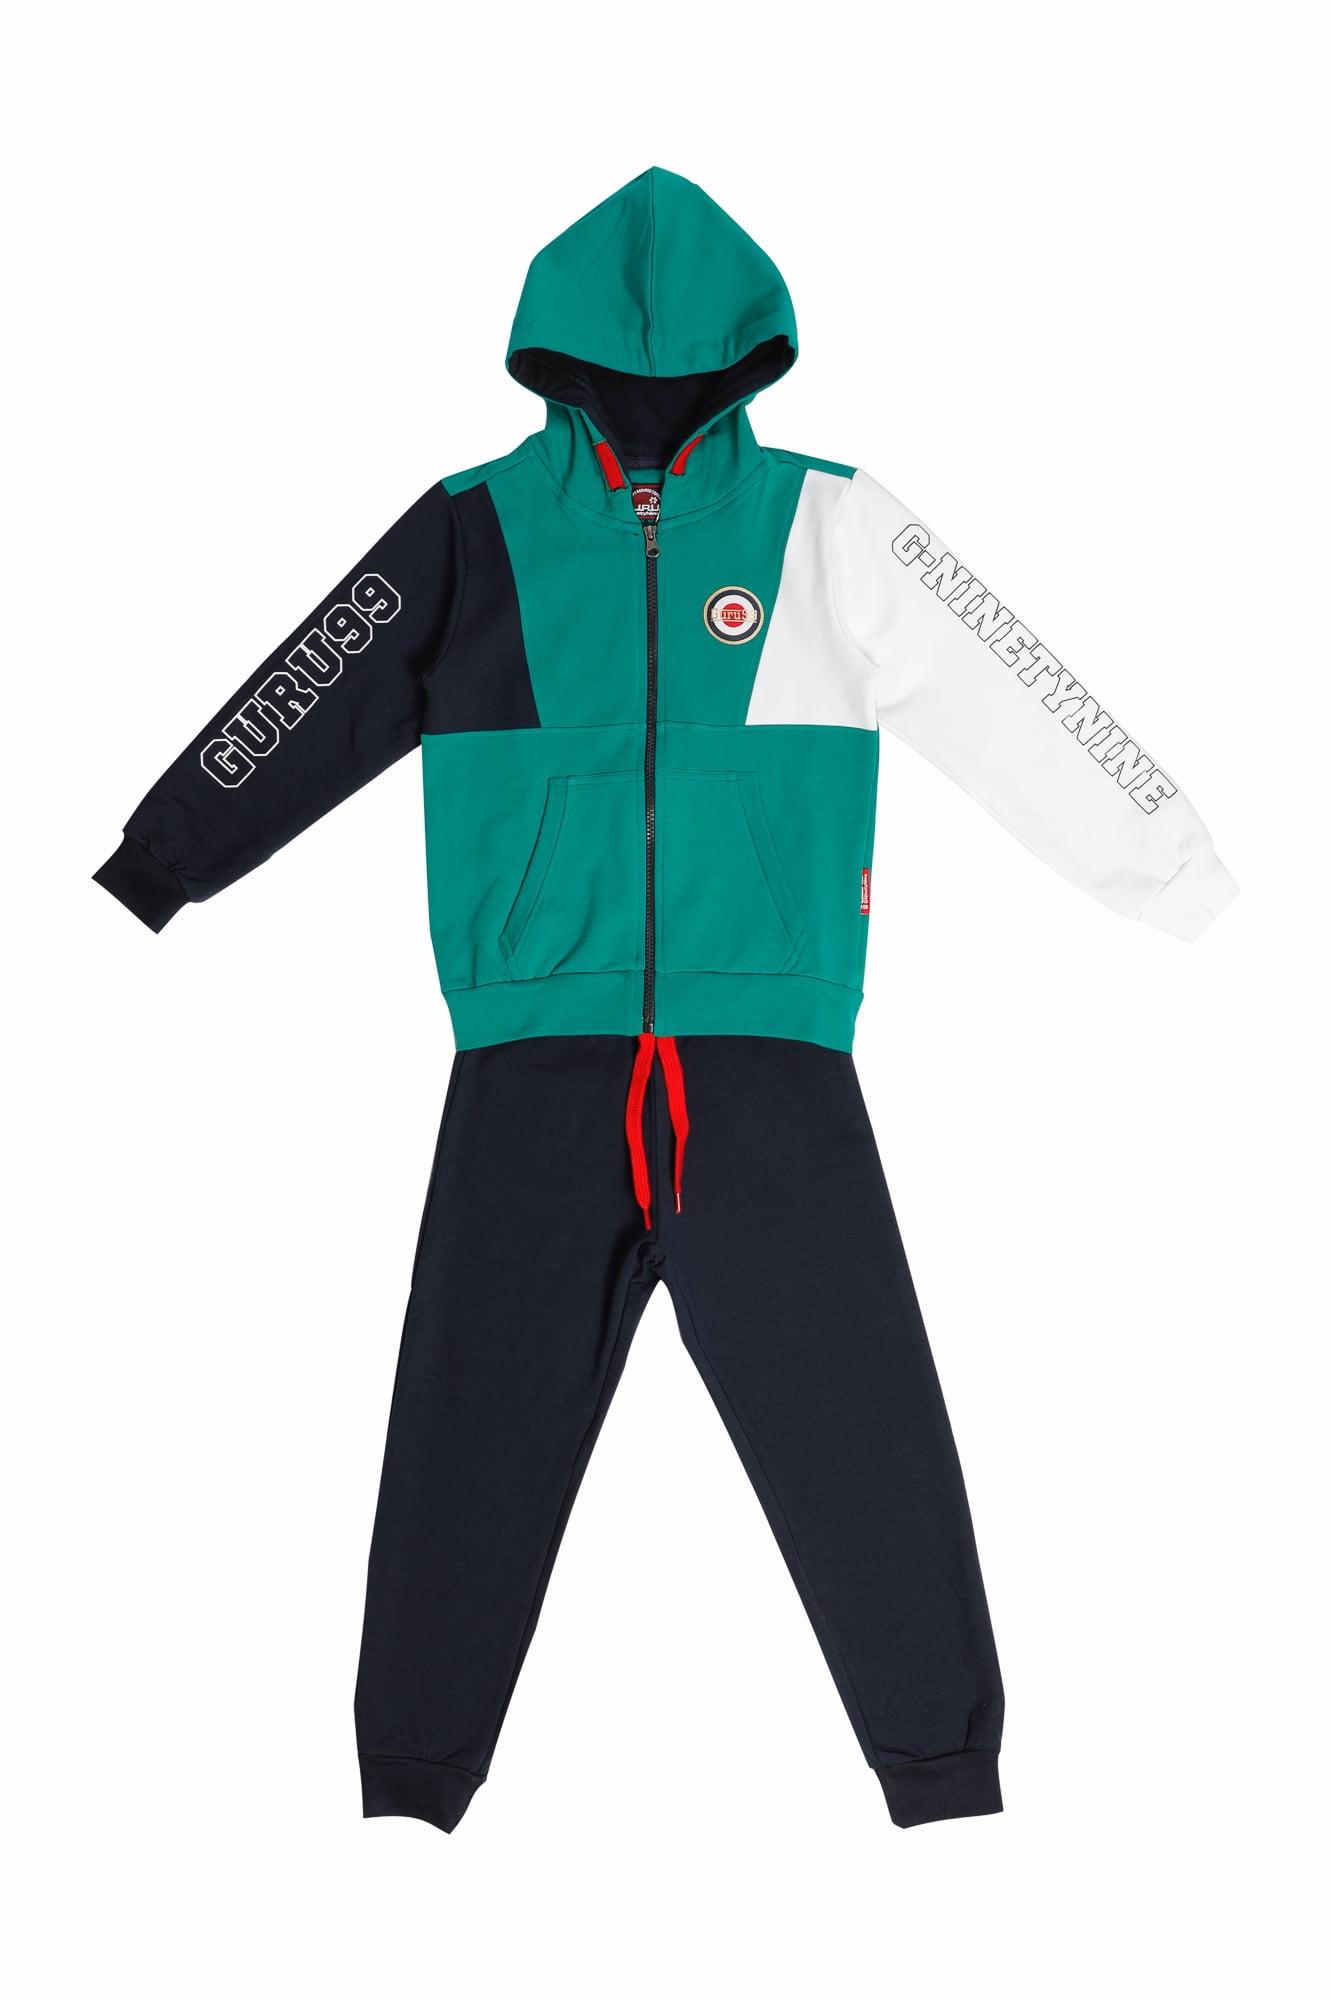 Tuta maschio Guru verde/bianco/blu con zip e cappuccio Pantalone Blu